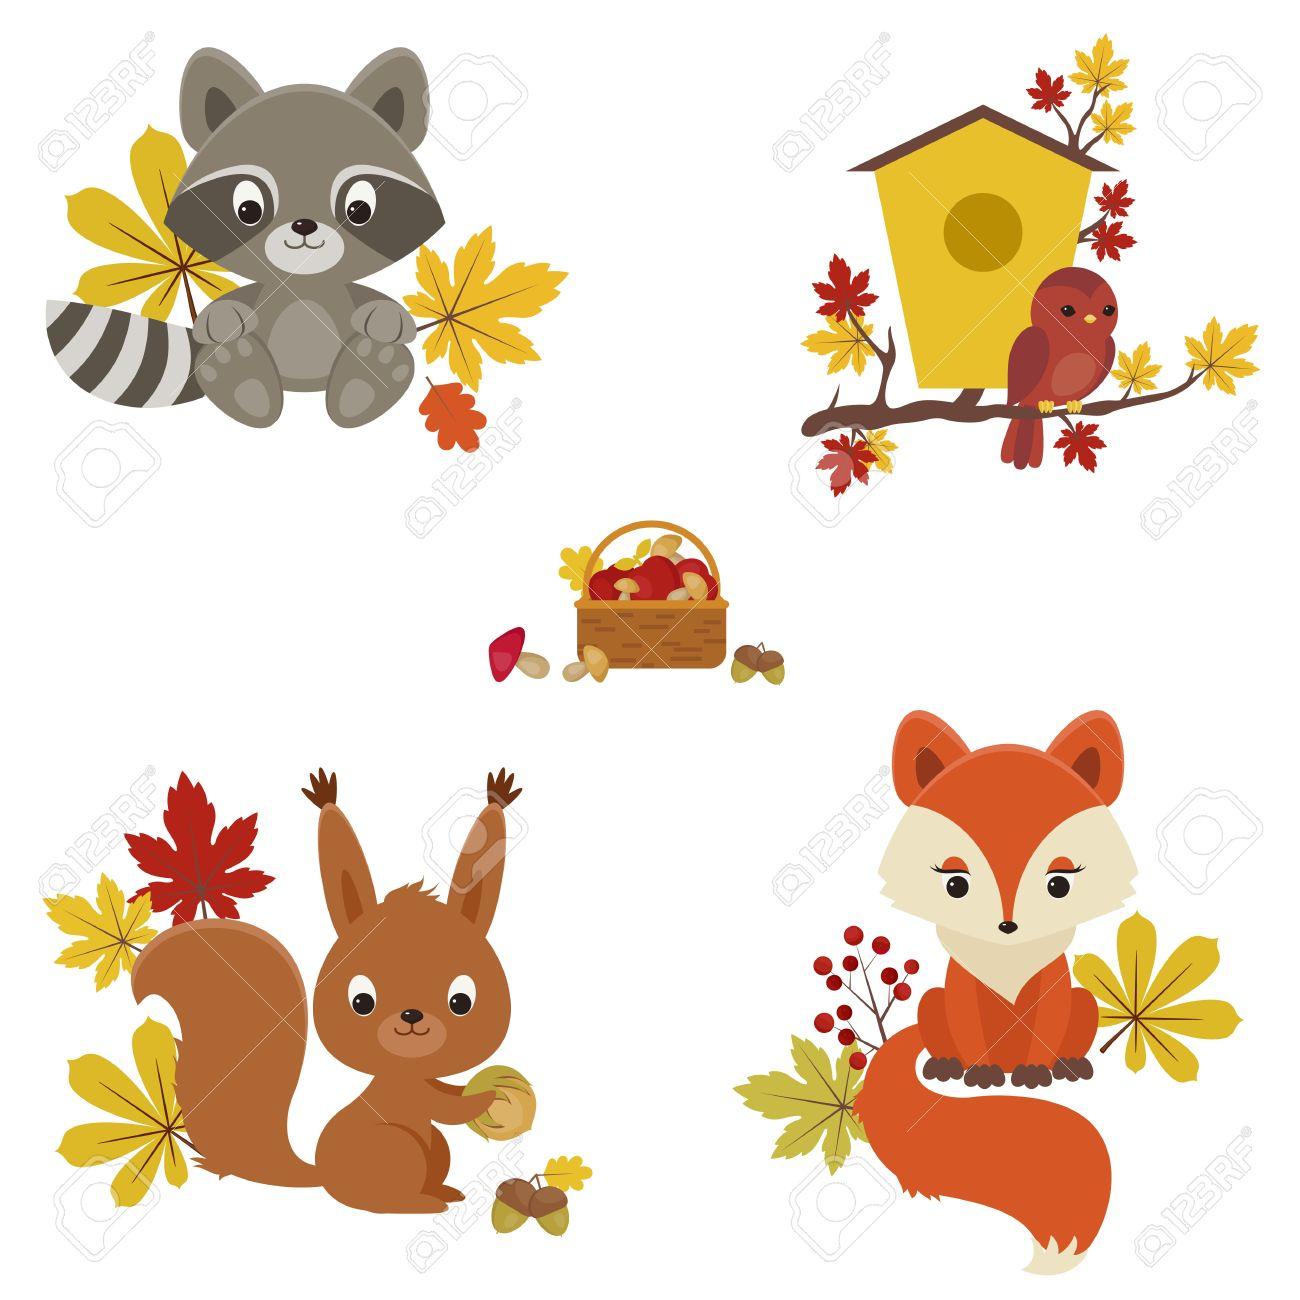 Autumn fox clipart vector Fox clipart autumn - 74 transparent clip arts, images and pictures ... vector